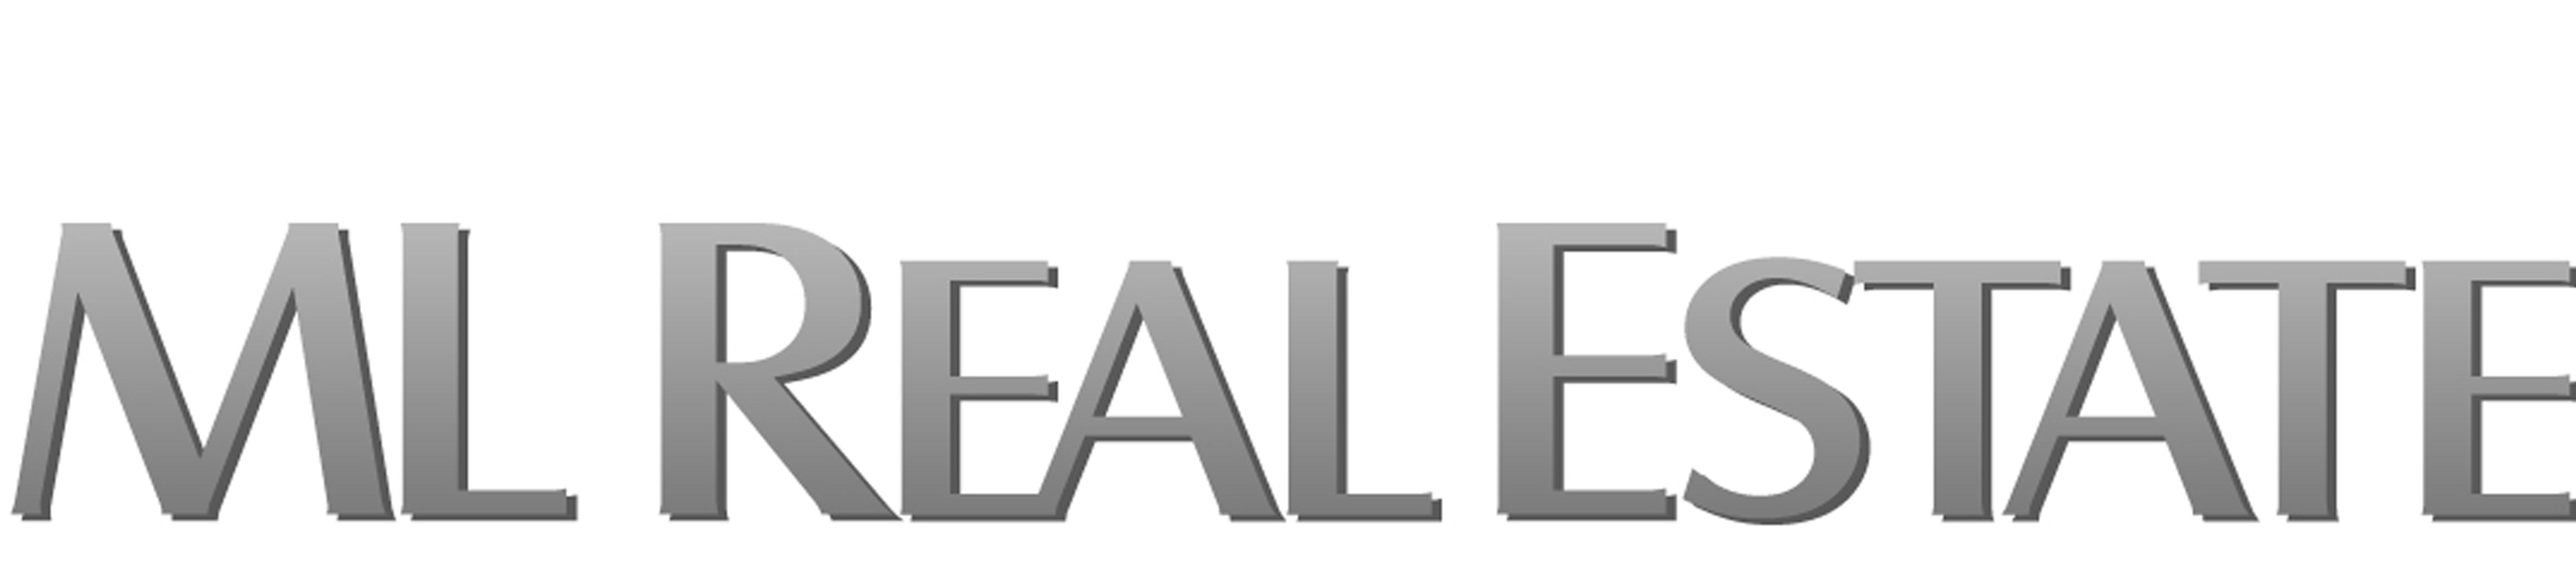 ML Real Estate Oy